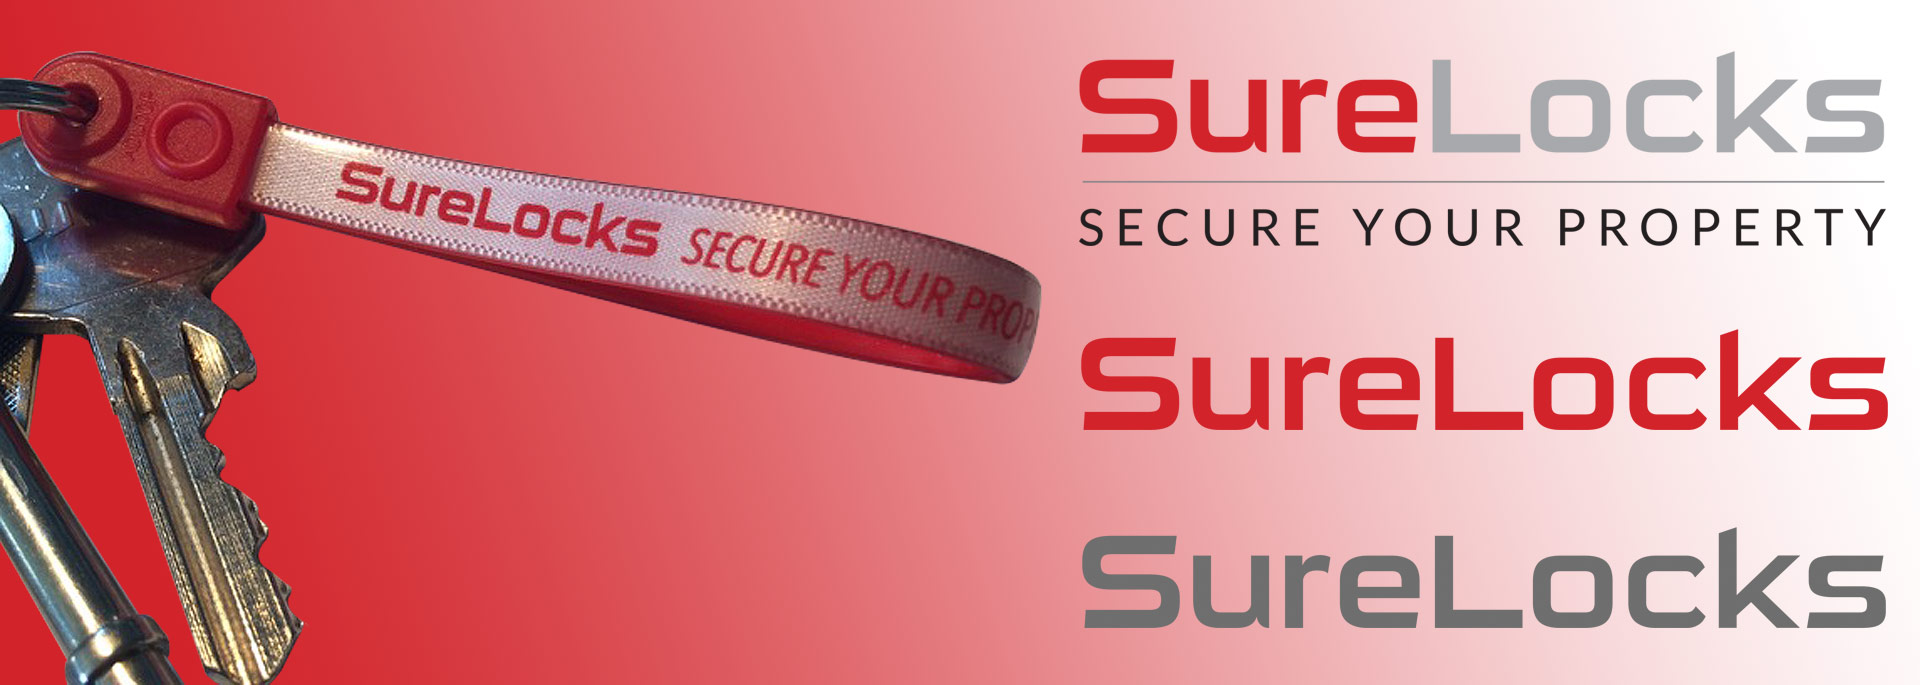 Sure Locks brand and website design